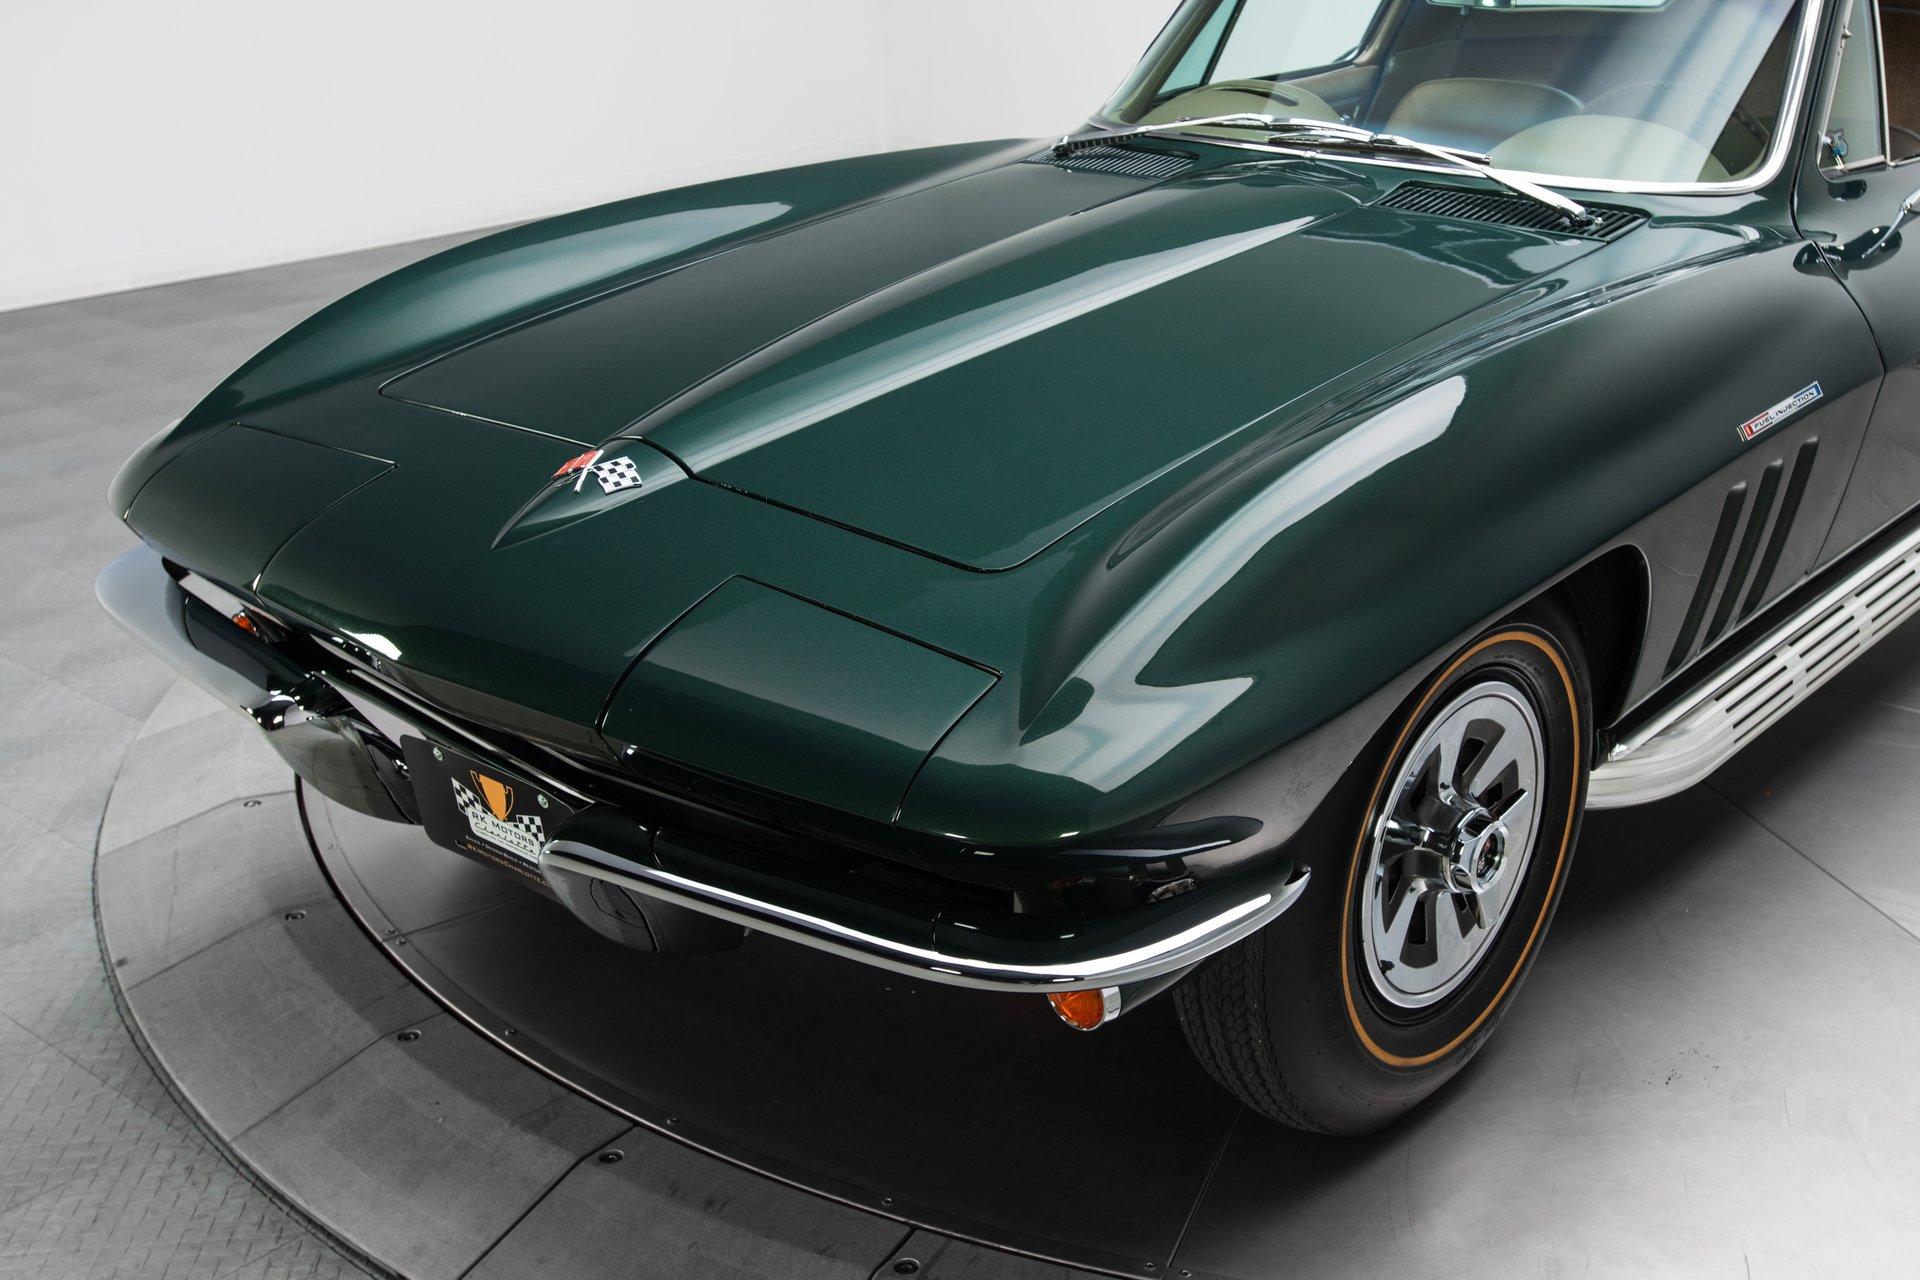 134704 1965 Chevrolet Corvette RK Motors Classic Cars for Sale